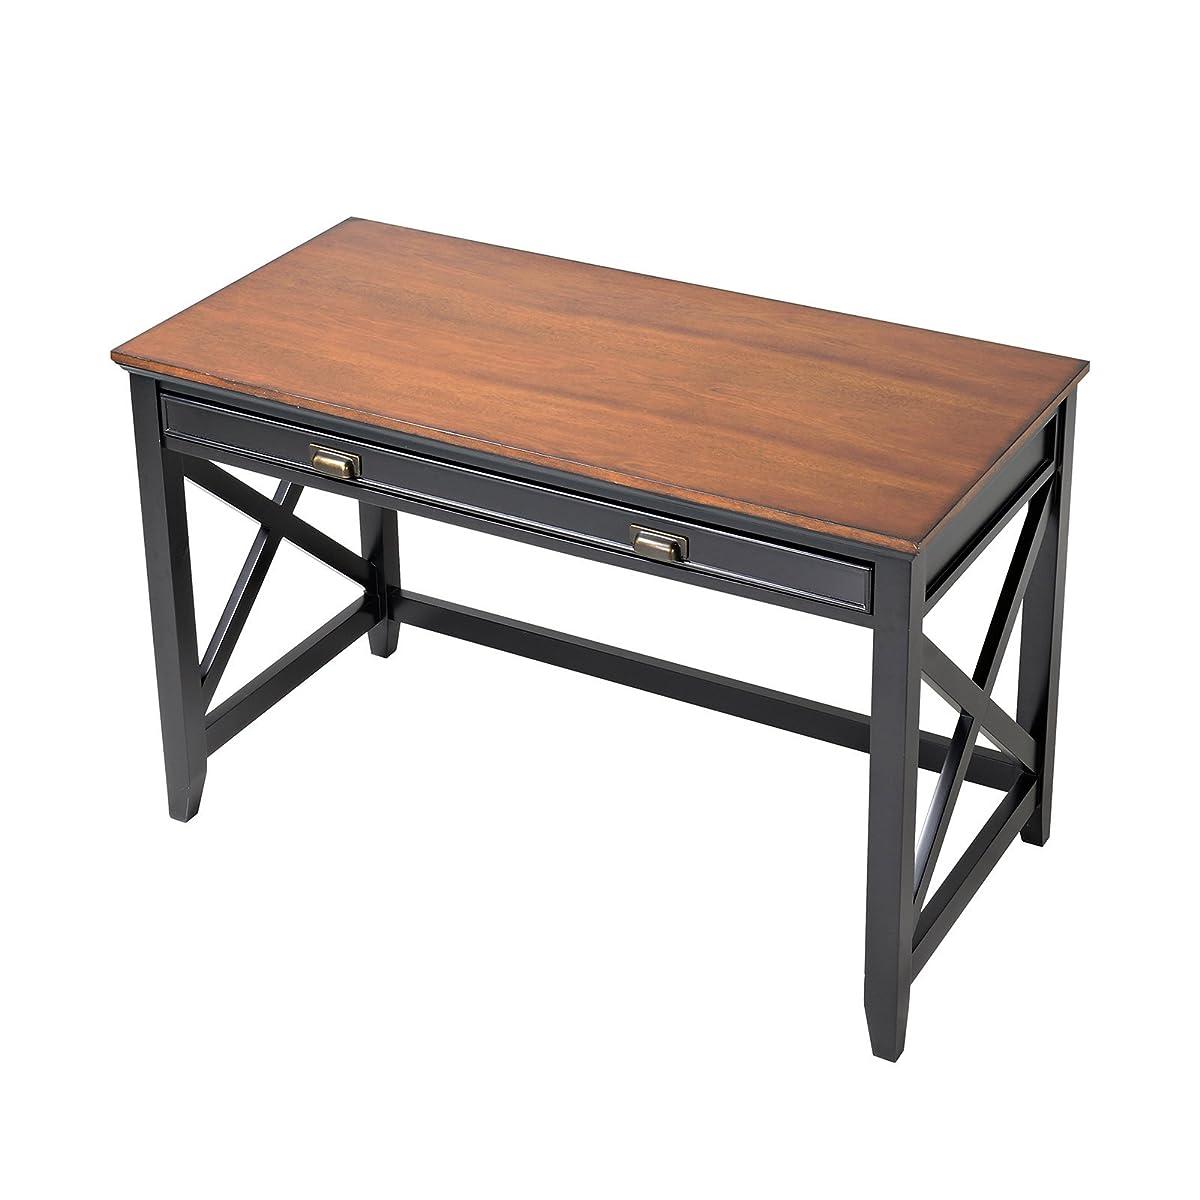 Homestar Writing Desk with 1 Drawer, Natural Wood Veneer